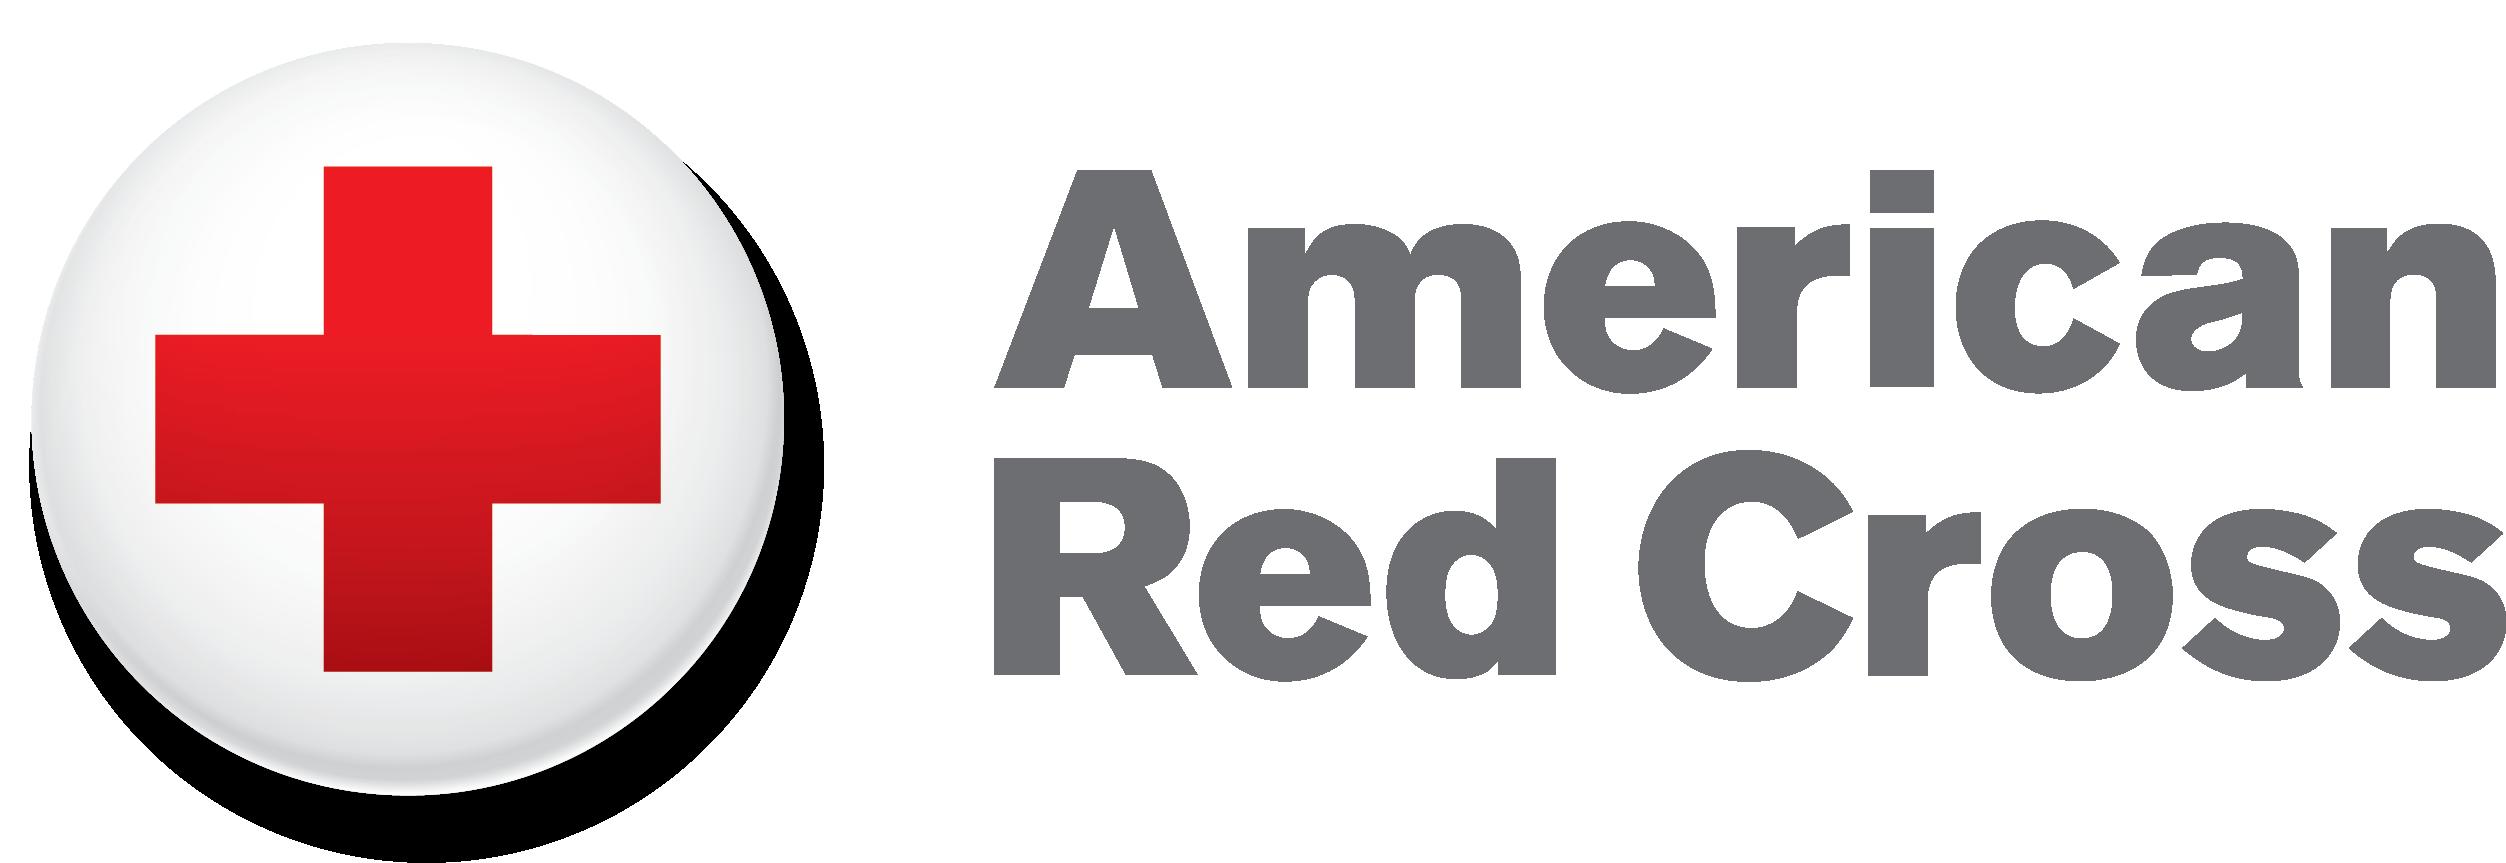 American Red Cross Logo PNG - 30589